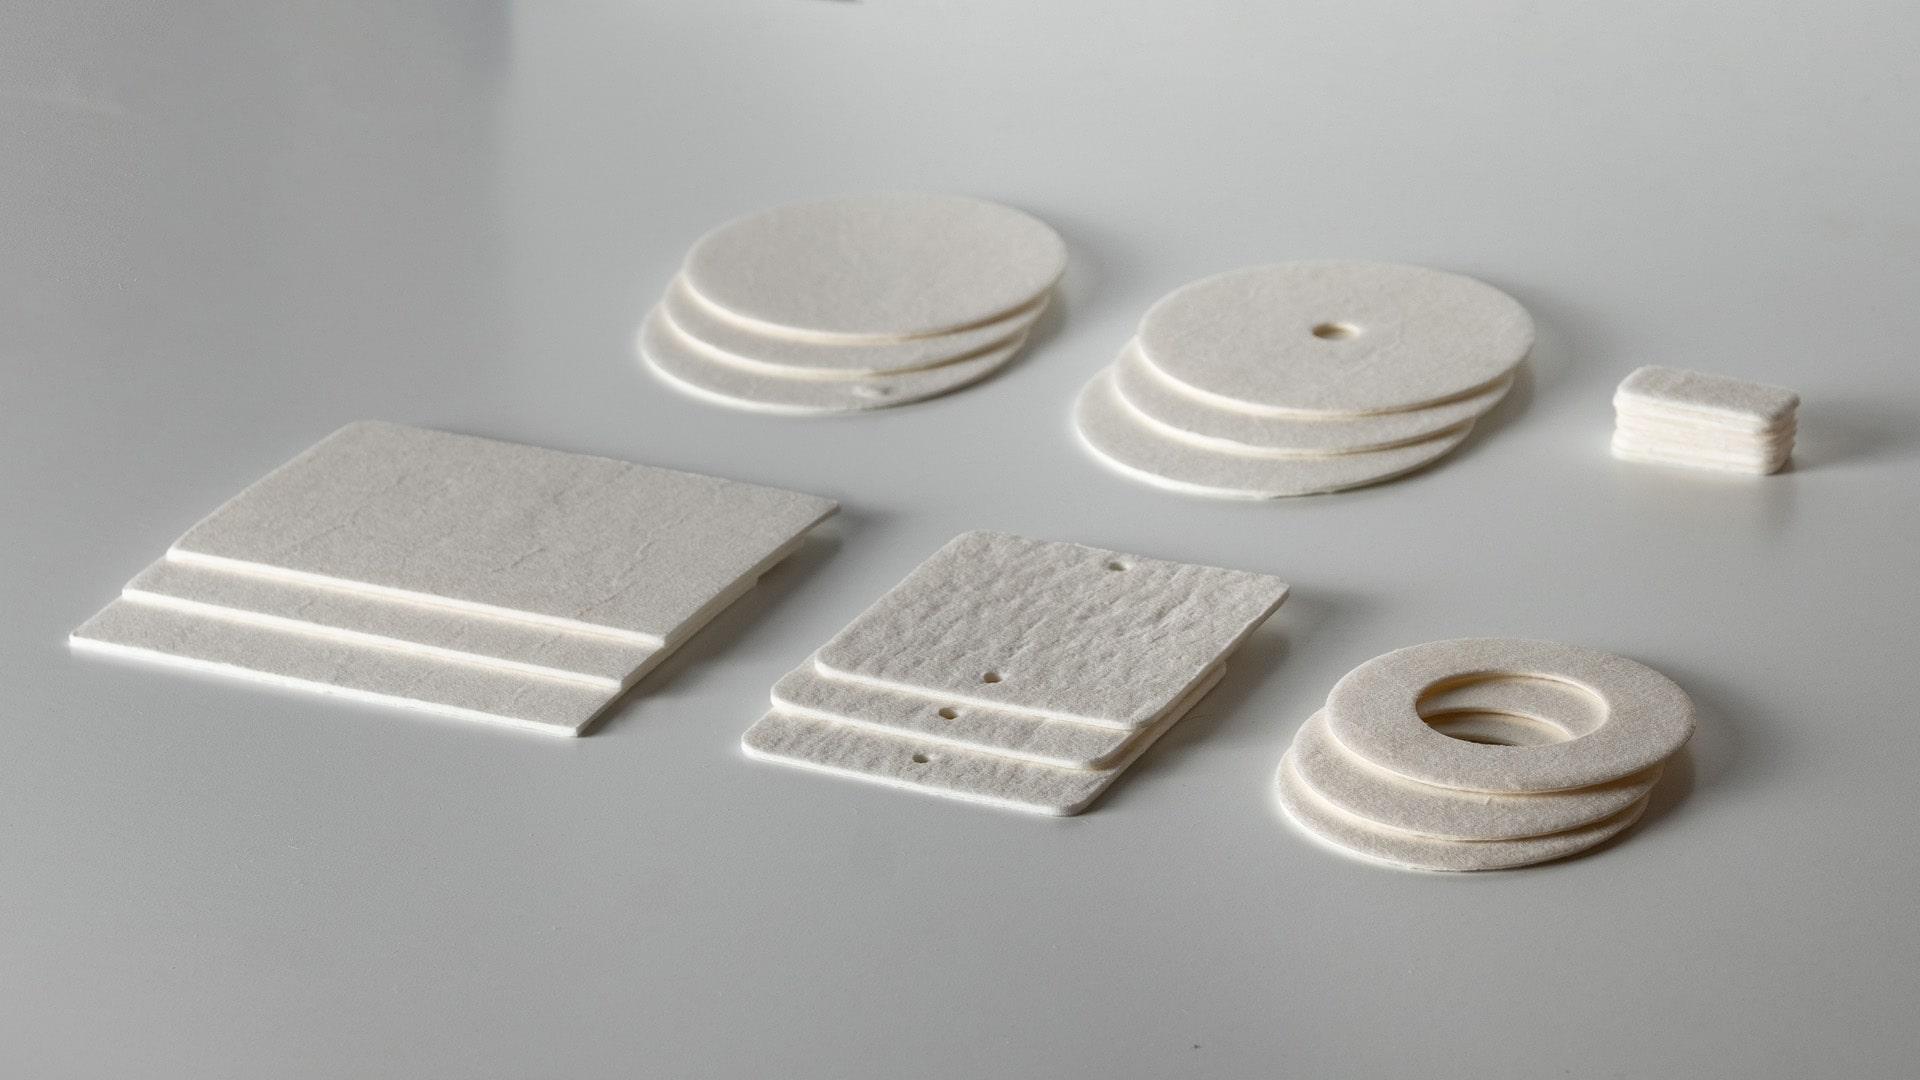 Air Freshening Paper - Blotting Paper